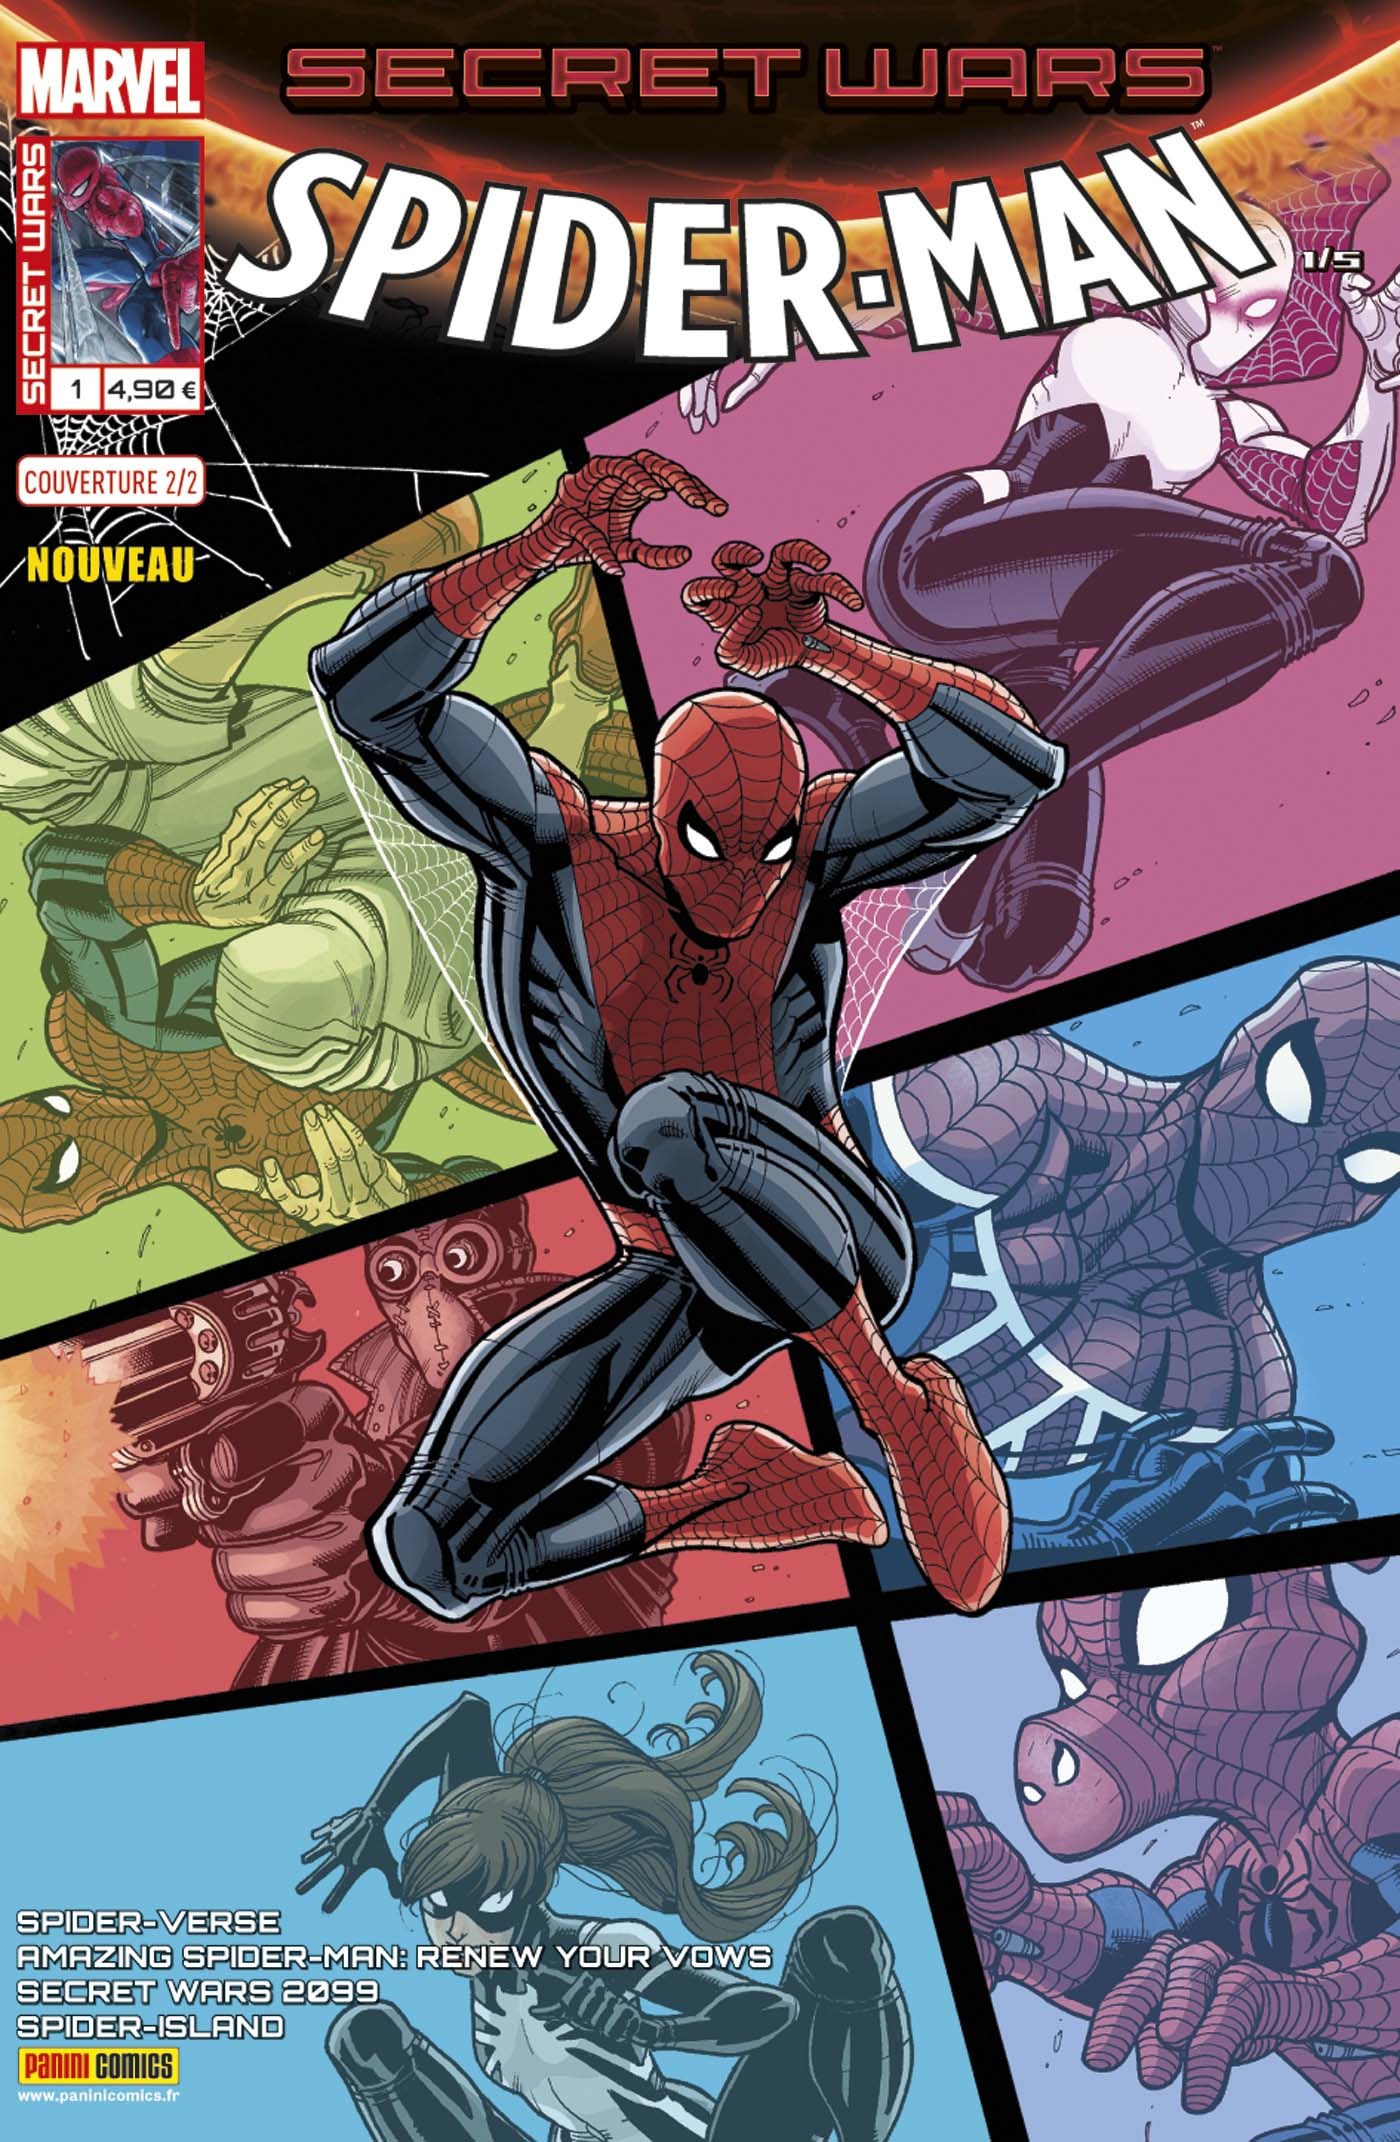 SECRET WARS : SPIDER-MAN 1 (Couv 2/2)